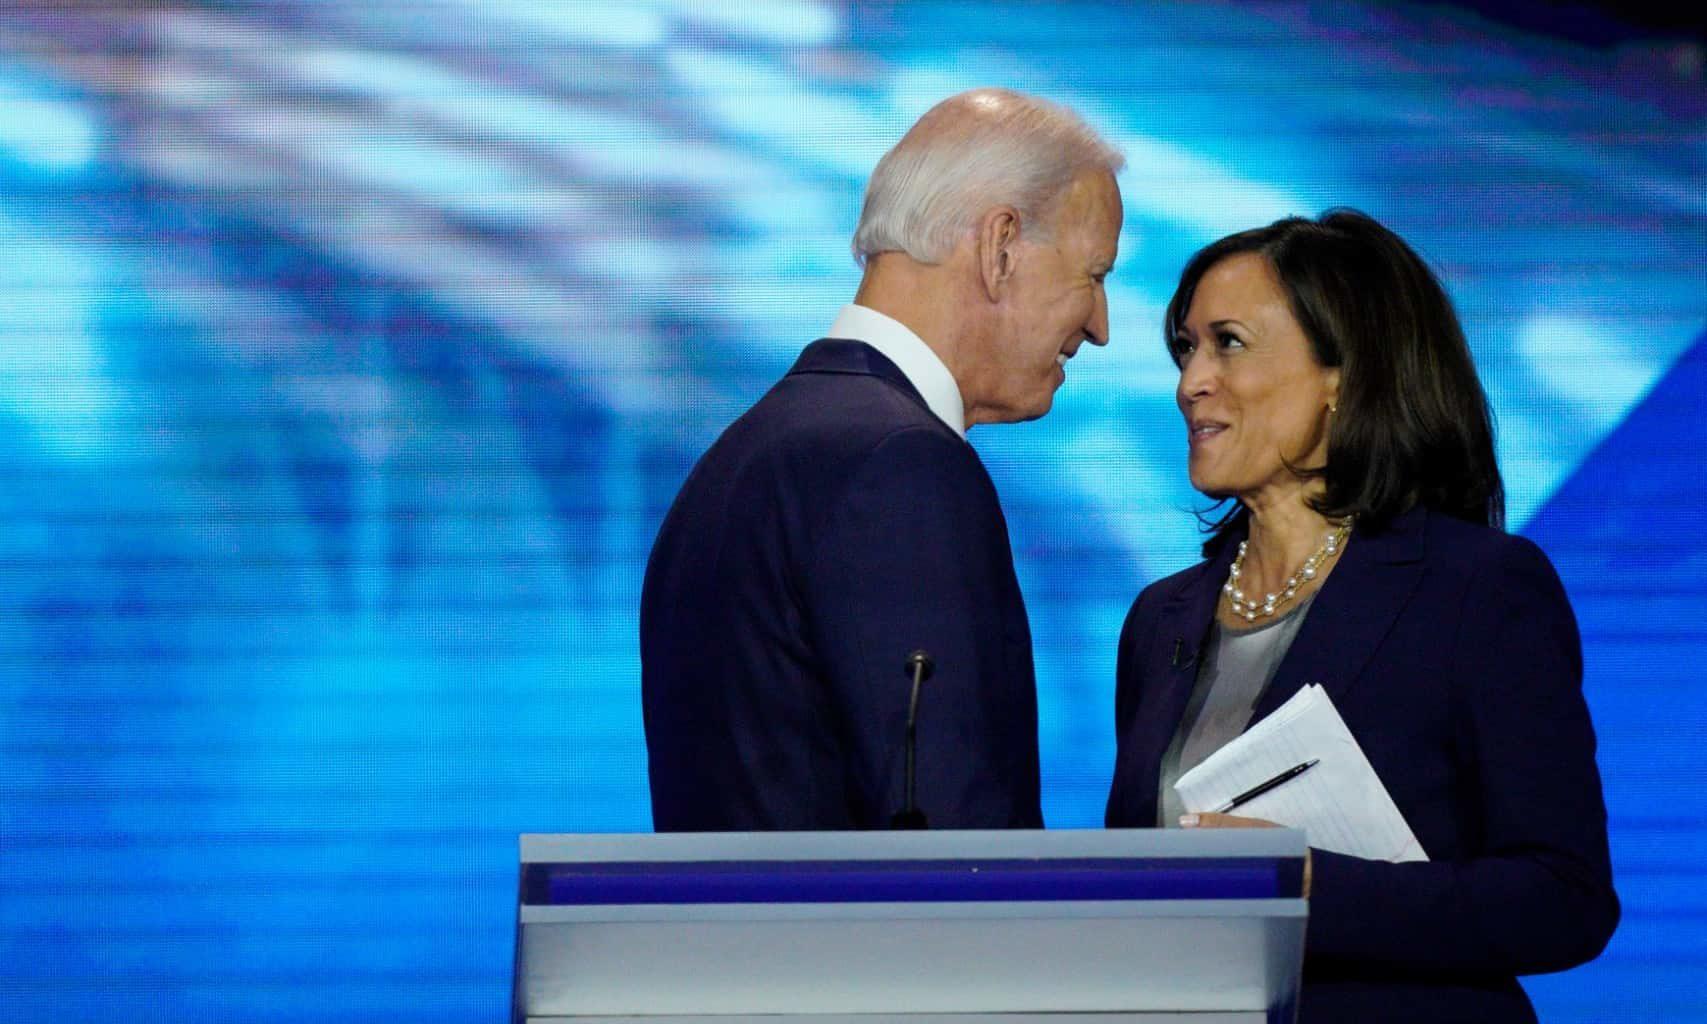 Sen. Feinstein Cracks Scathing Joke About Jeb Bush Candidacy